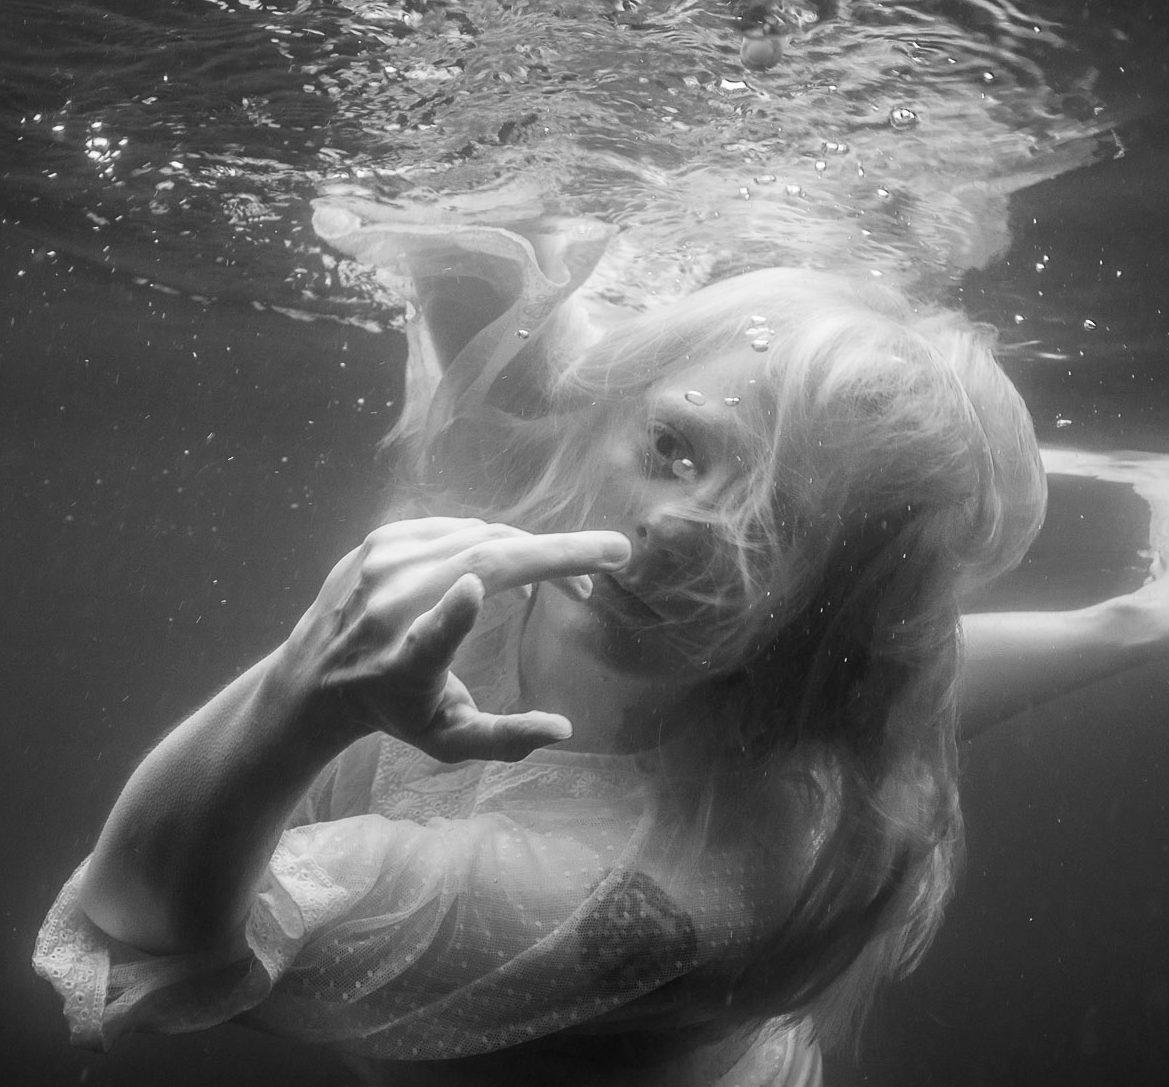 Cornelia, atemlos – monochrome